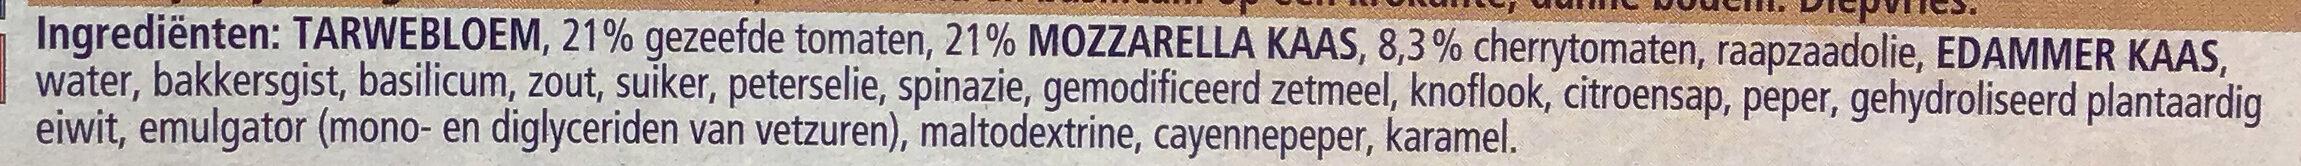 Ristorante Pizza Mozzarella - Ingrediënten - nl